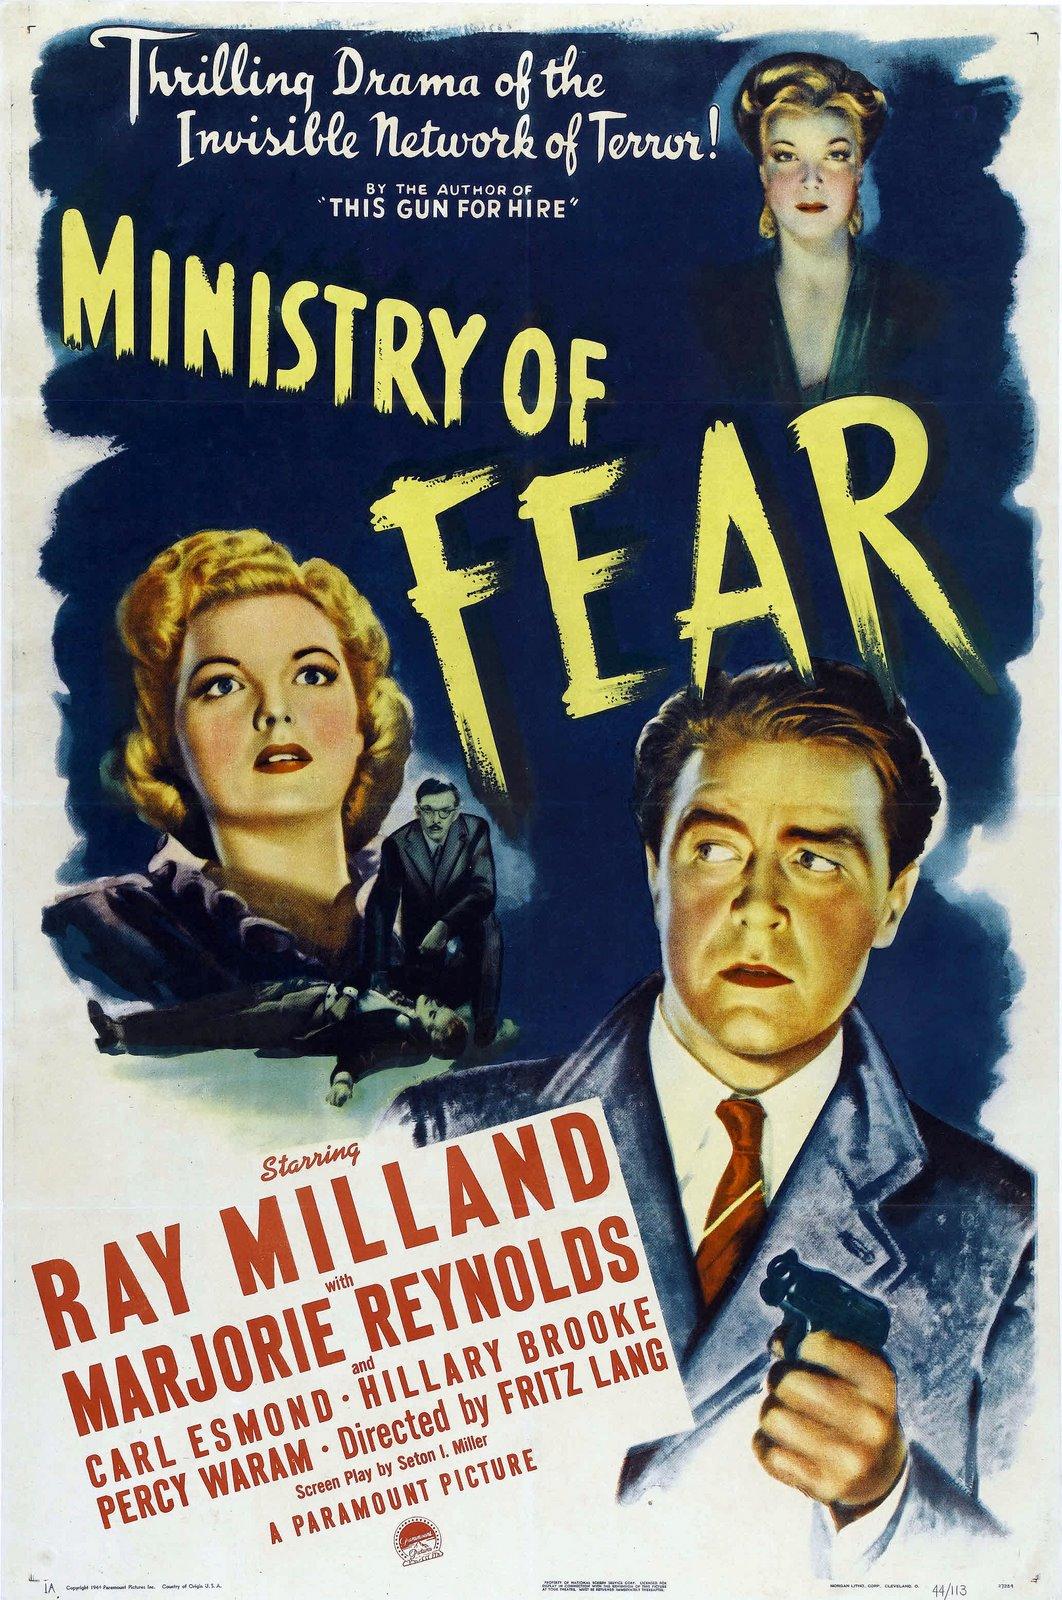 http://2.bp.blogspot.com/_yg0wzuV8KA0/SOBFZk111aI/AAAAAAAABjQ/bzHCc3i0aNc/s1600/ministry+of+fear.jpg